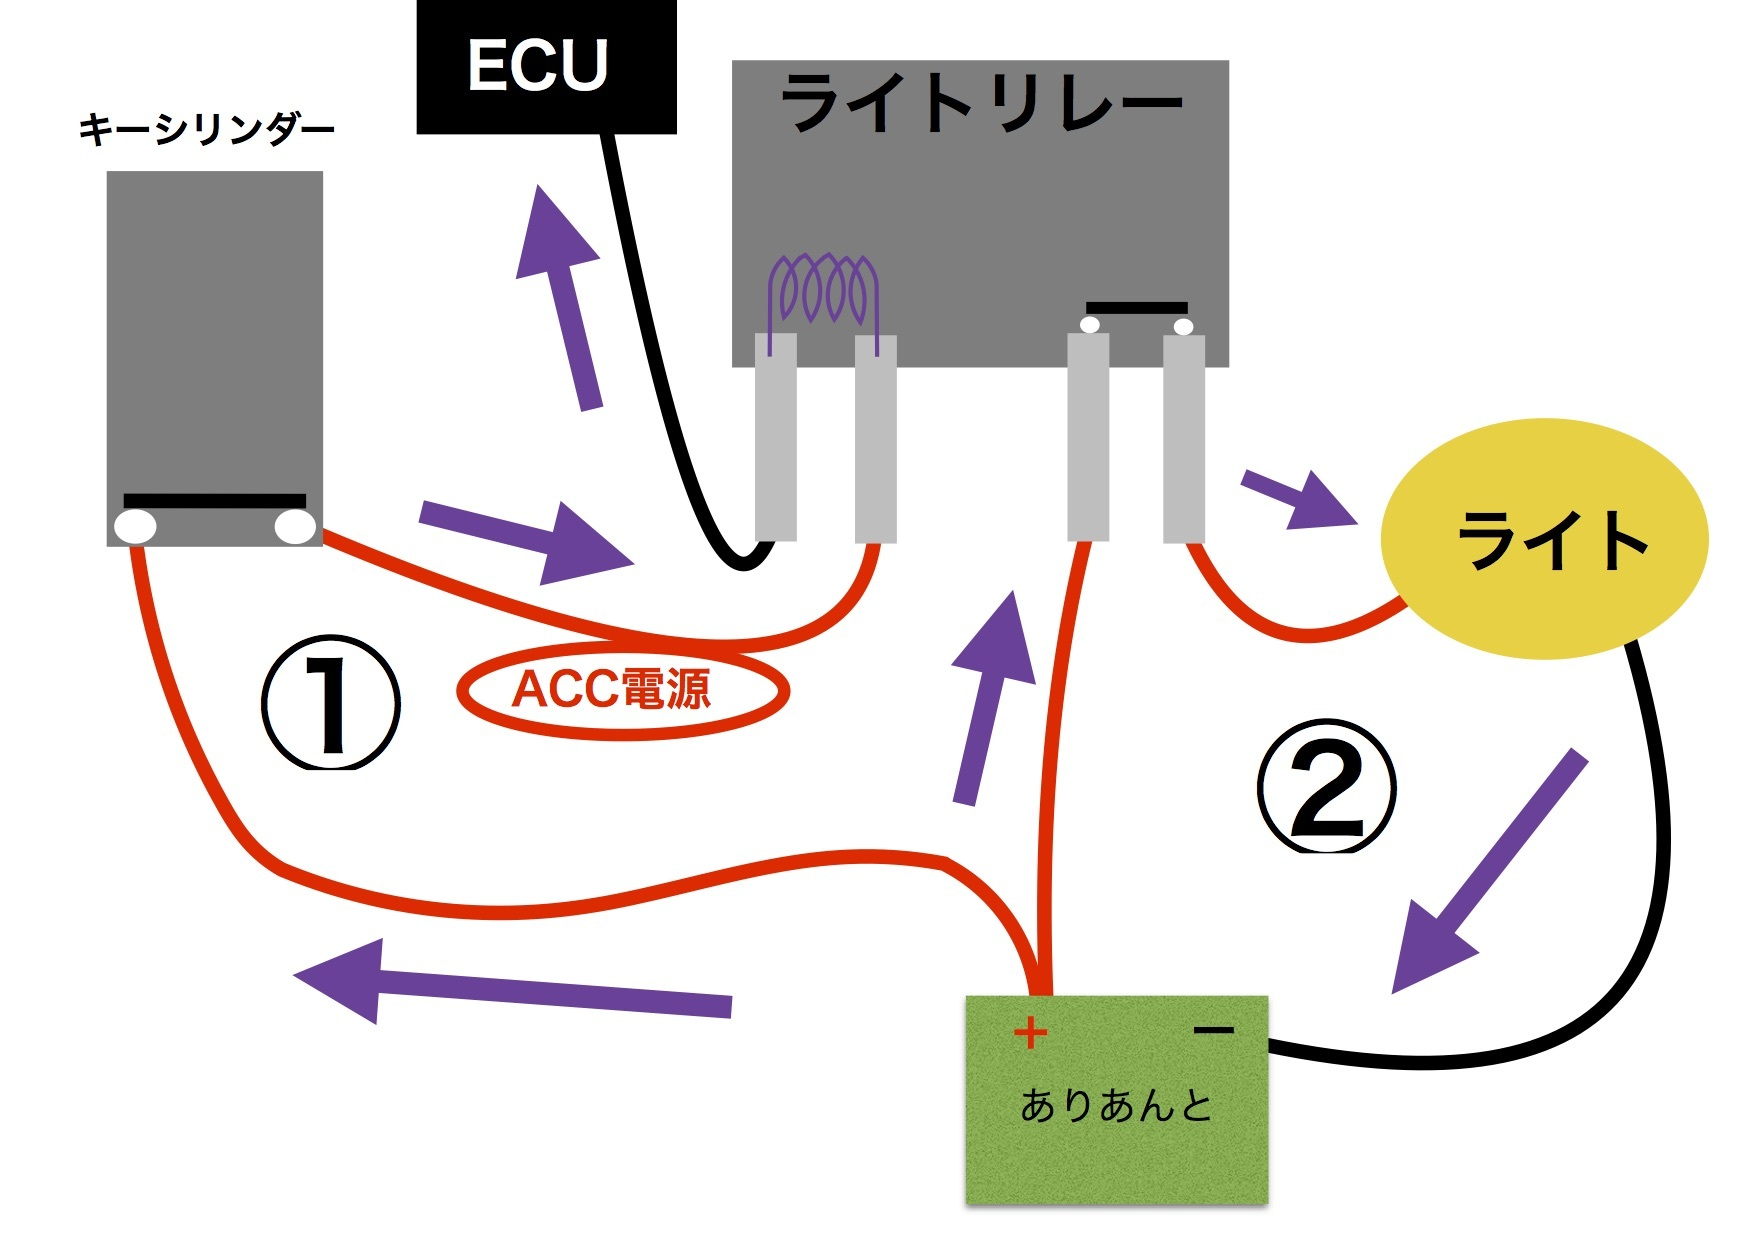 【DB7】サーミスタ回路 ACC電源がアレの件。原因はリレーだ!!_e0159646_05183094.jpg